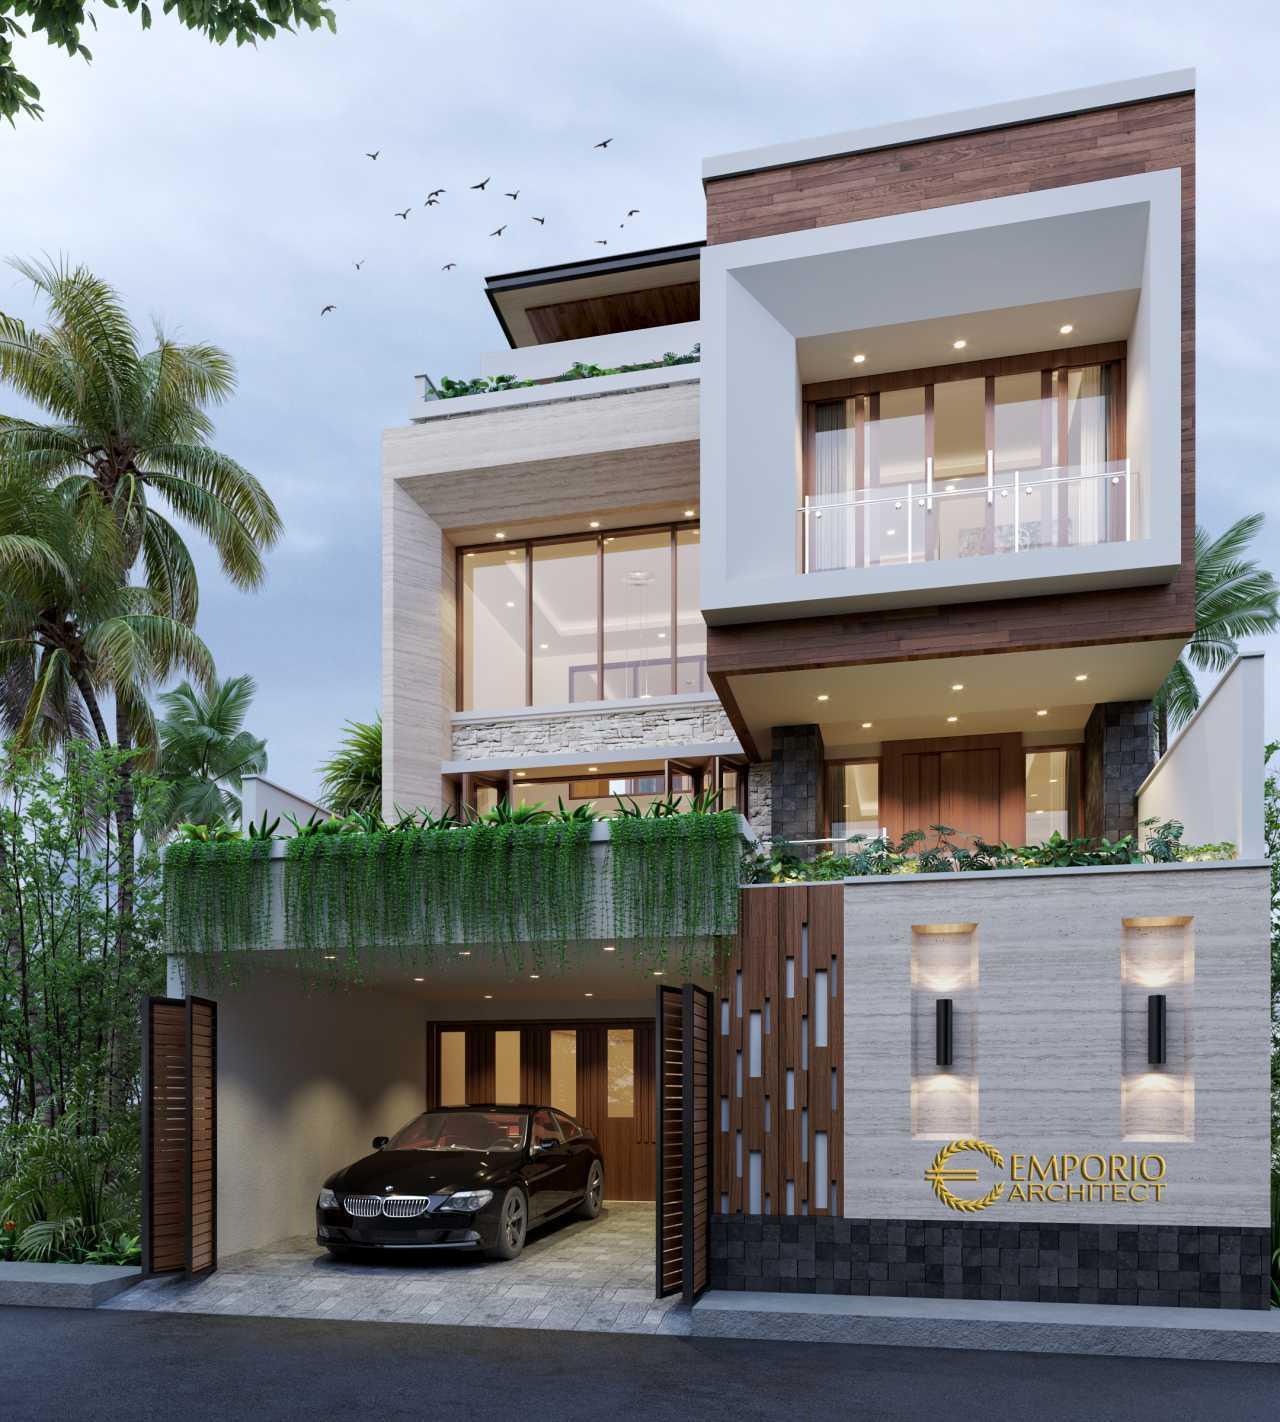 Emporio Architect Jasa Arsitek Badung Desain Rumah Modern 2 Lantai 726 @ Petitenget, Badung, Bali Kabupaten Badung, Bali, Indonesia Kabupaten Badung, Bali, Indonesia Emporio-Architect-Jasa-Arsitek-Badung-Desain-Rumah-Modern-2-Lantai-726-Petitenget-Badung-Bali  93950